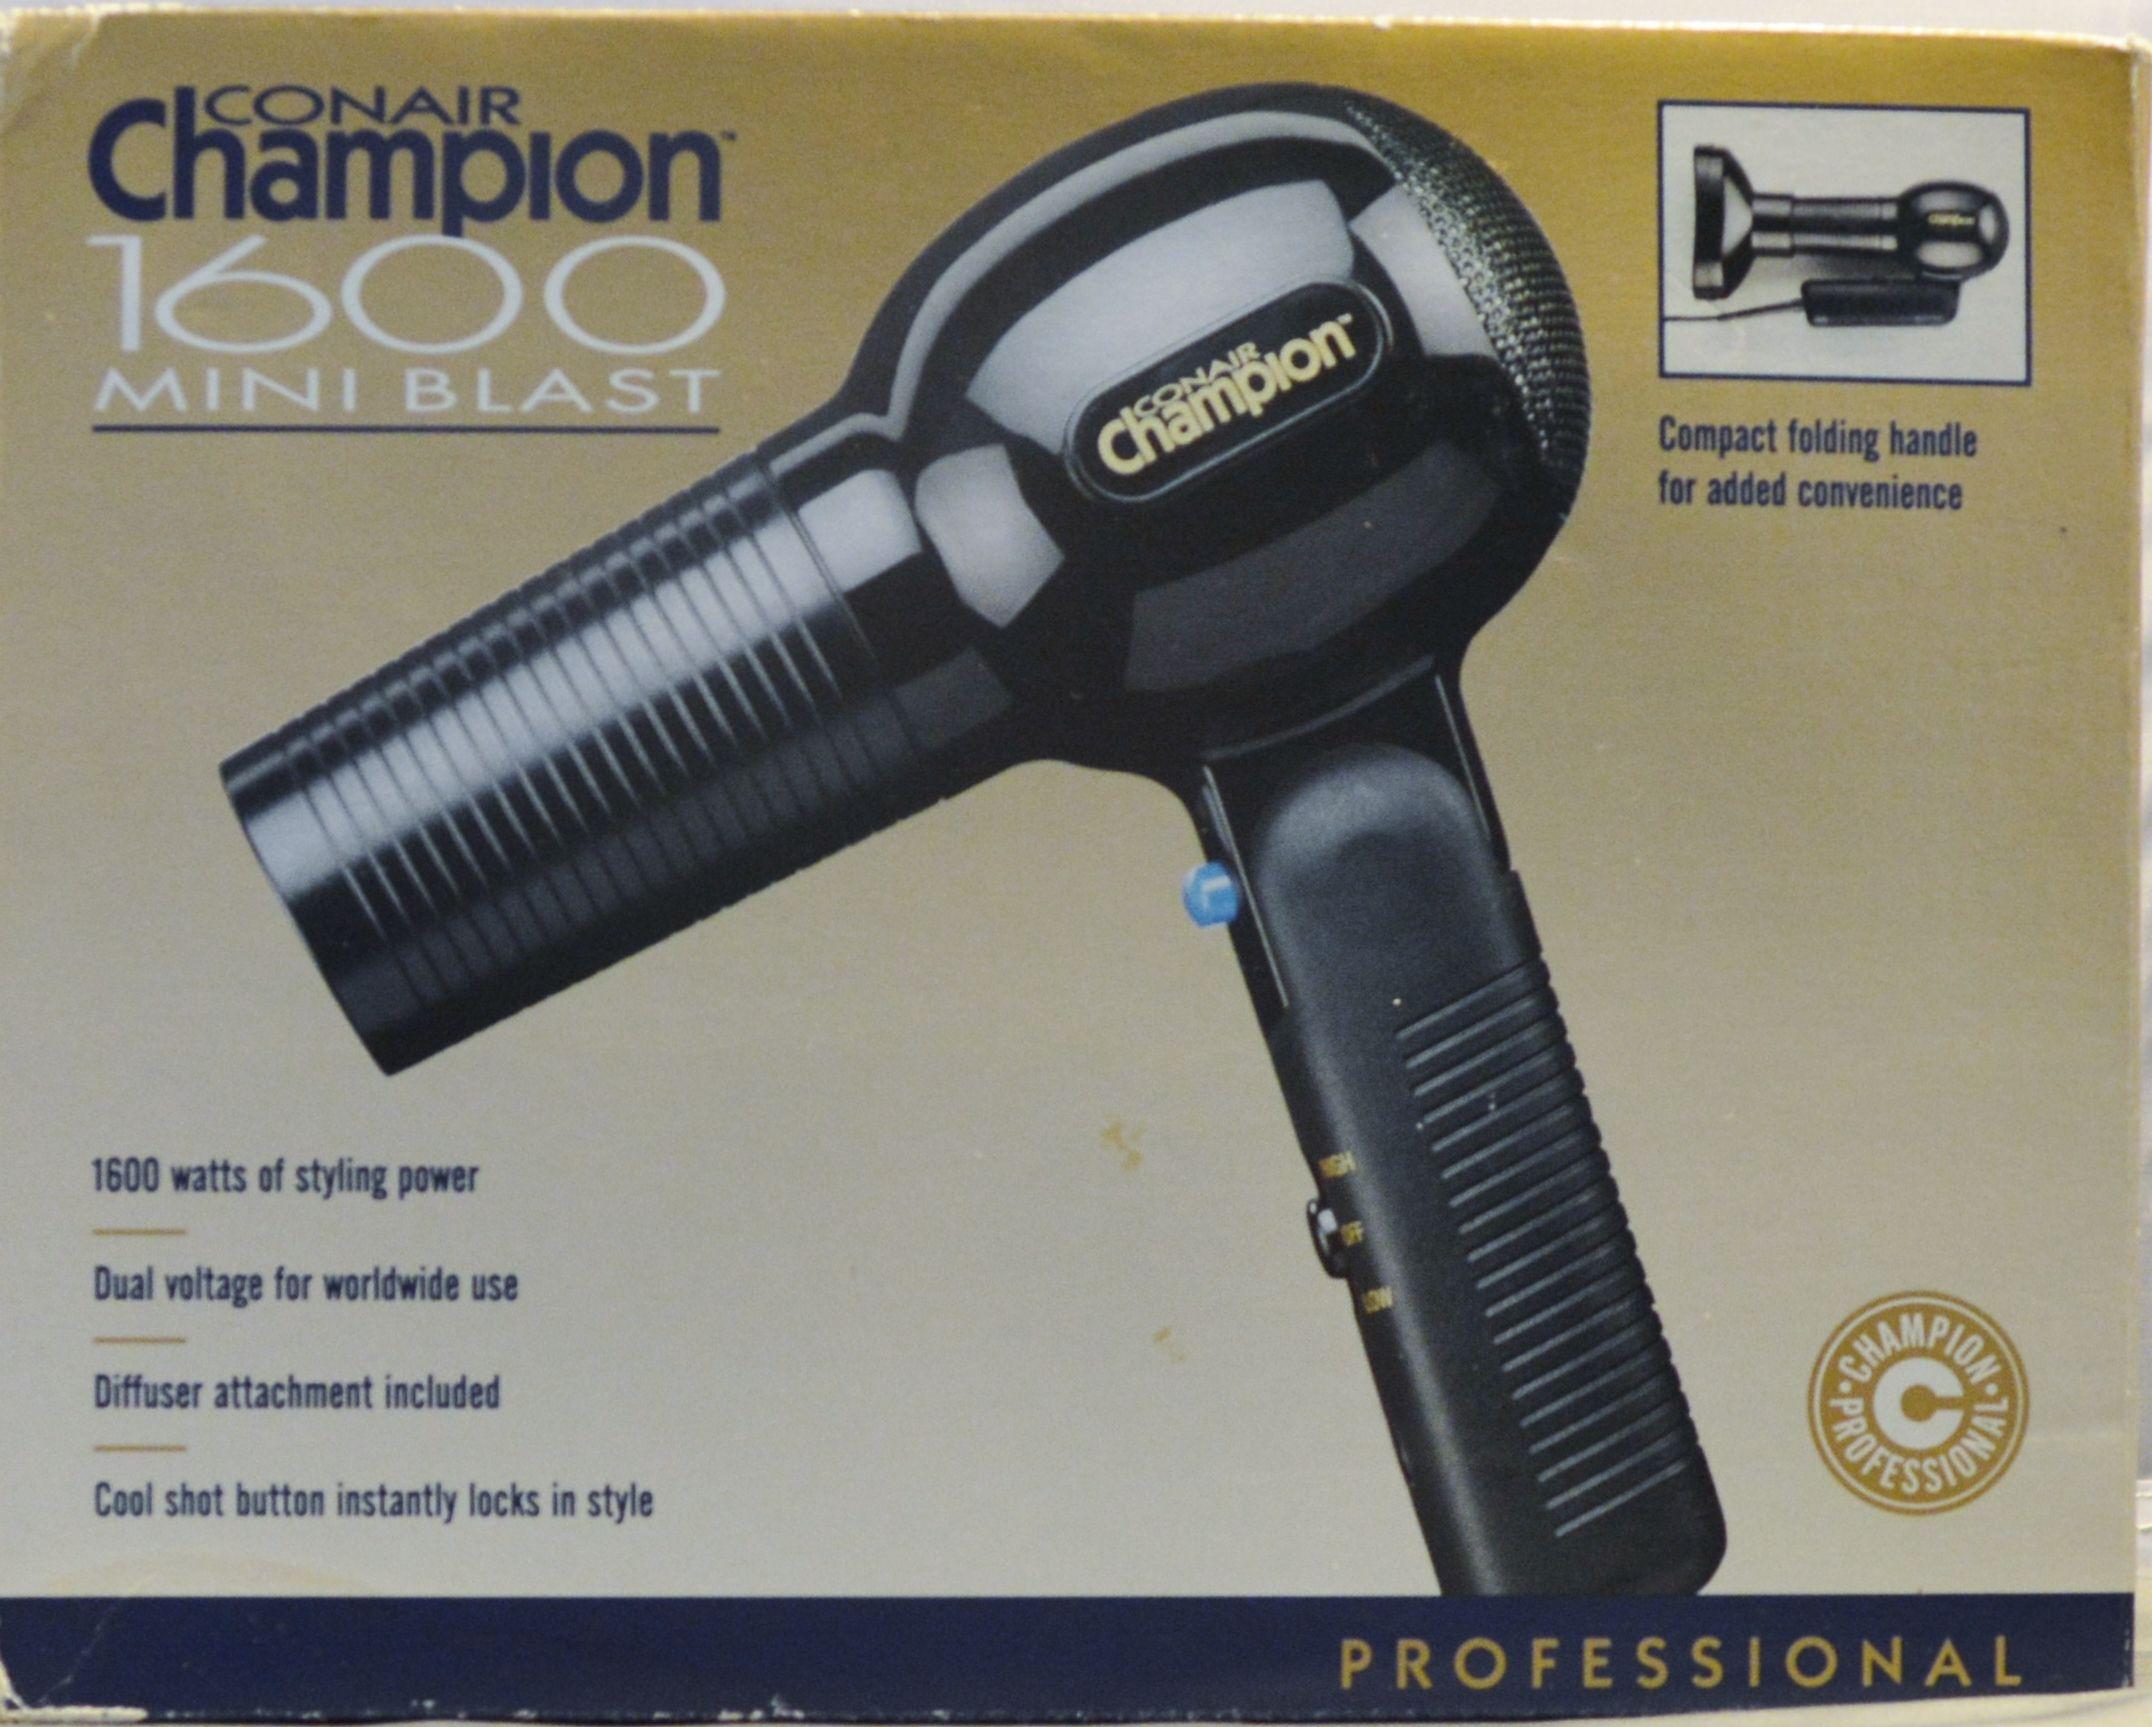 Conair Champion 1600 Mini Blast Professional Hair Dryer